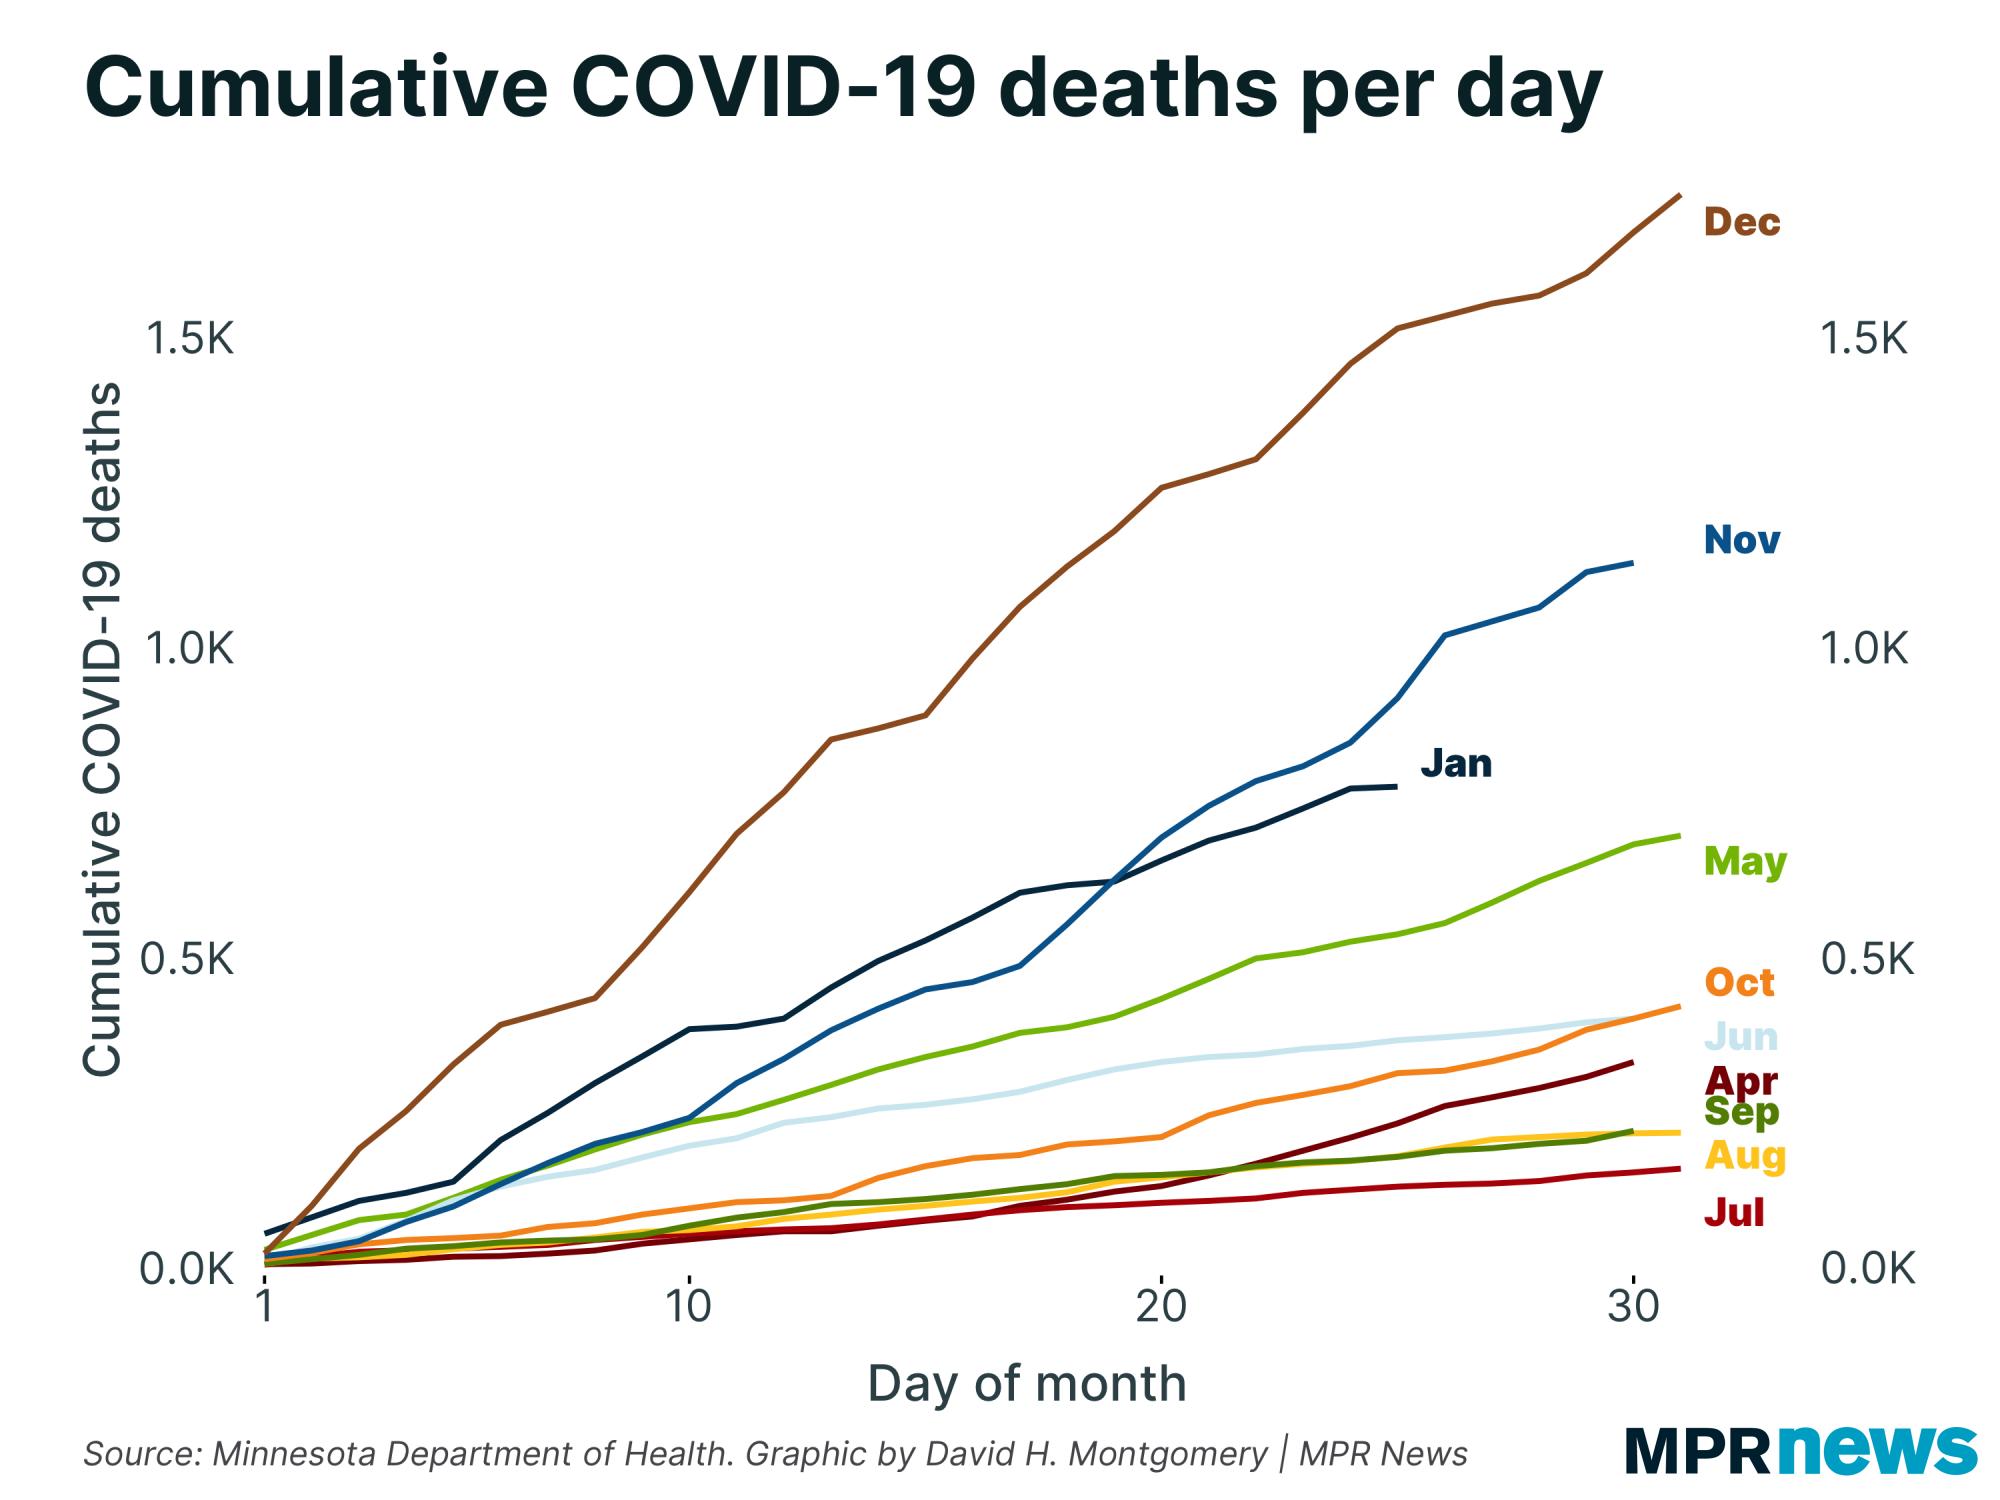 Cumulative COVID-19 deaths per day by month